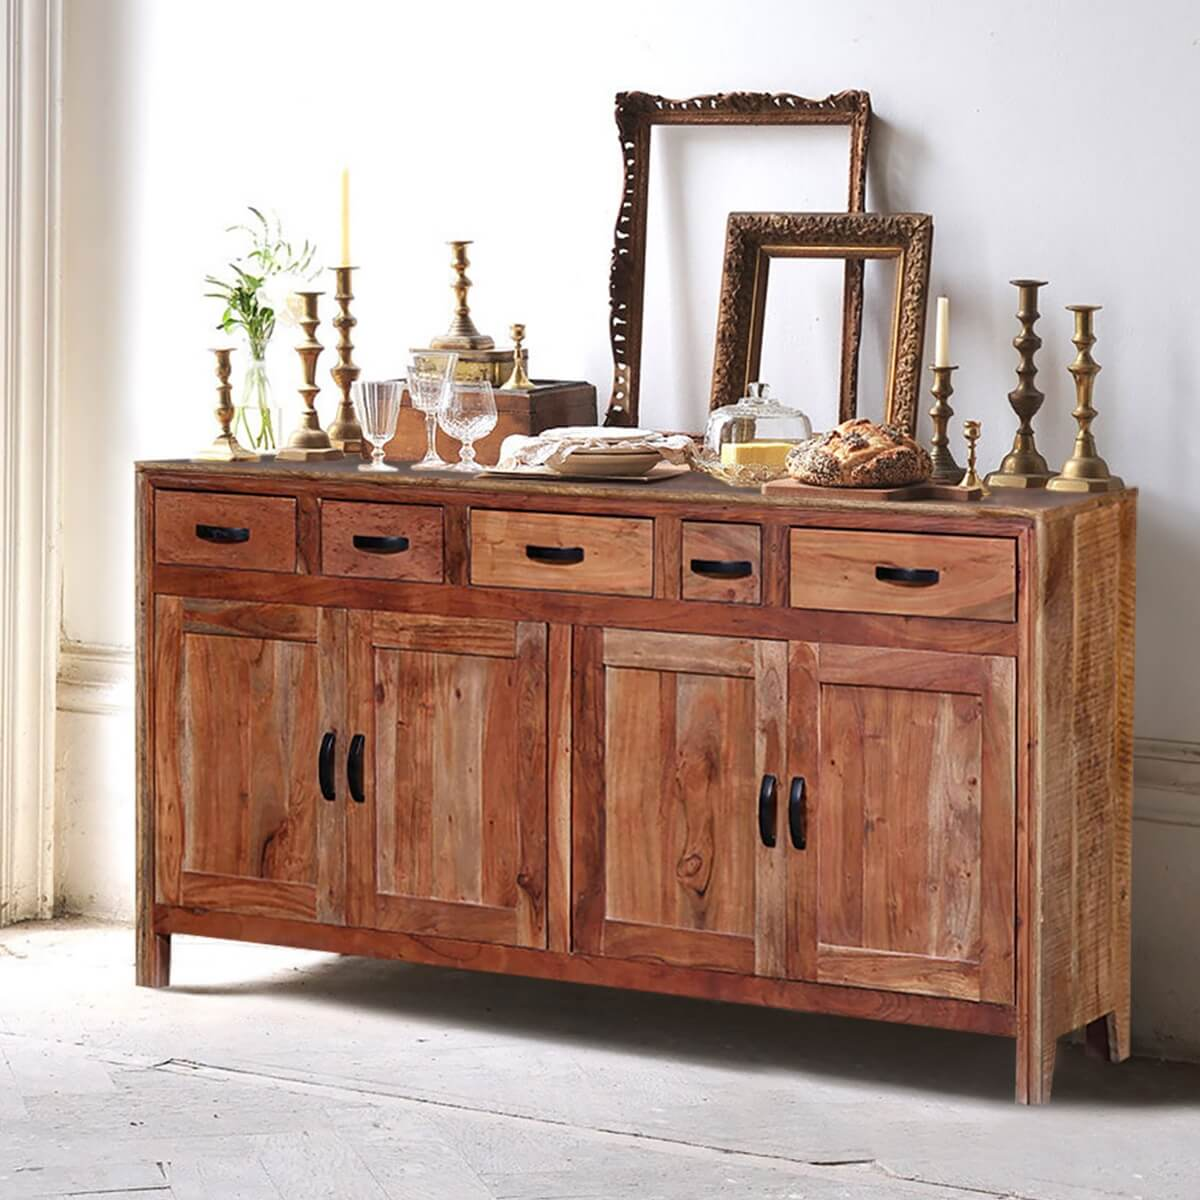 Masardis Reclaimed Wood 4 Drawer Rustic Sideboard Cabinet